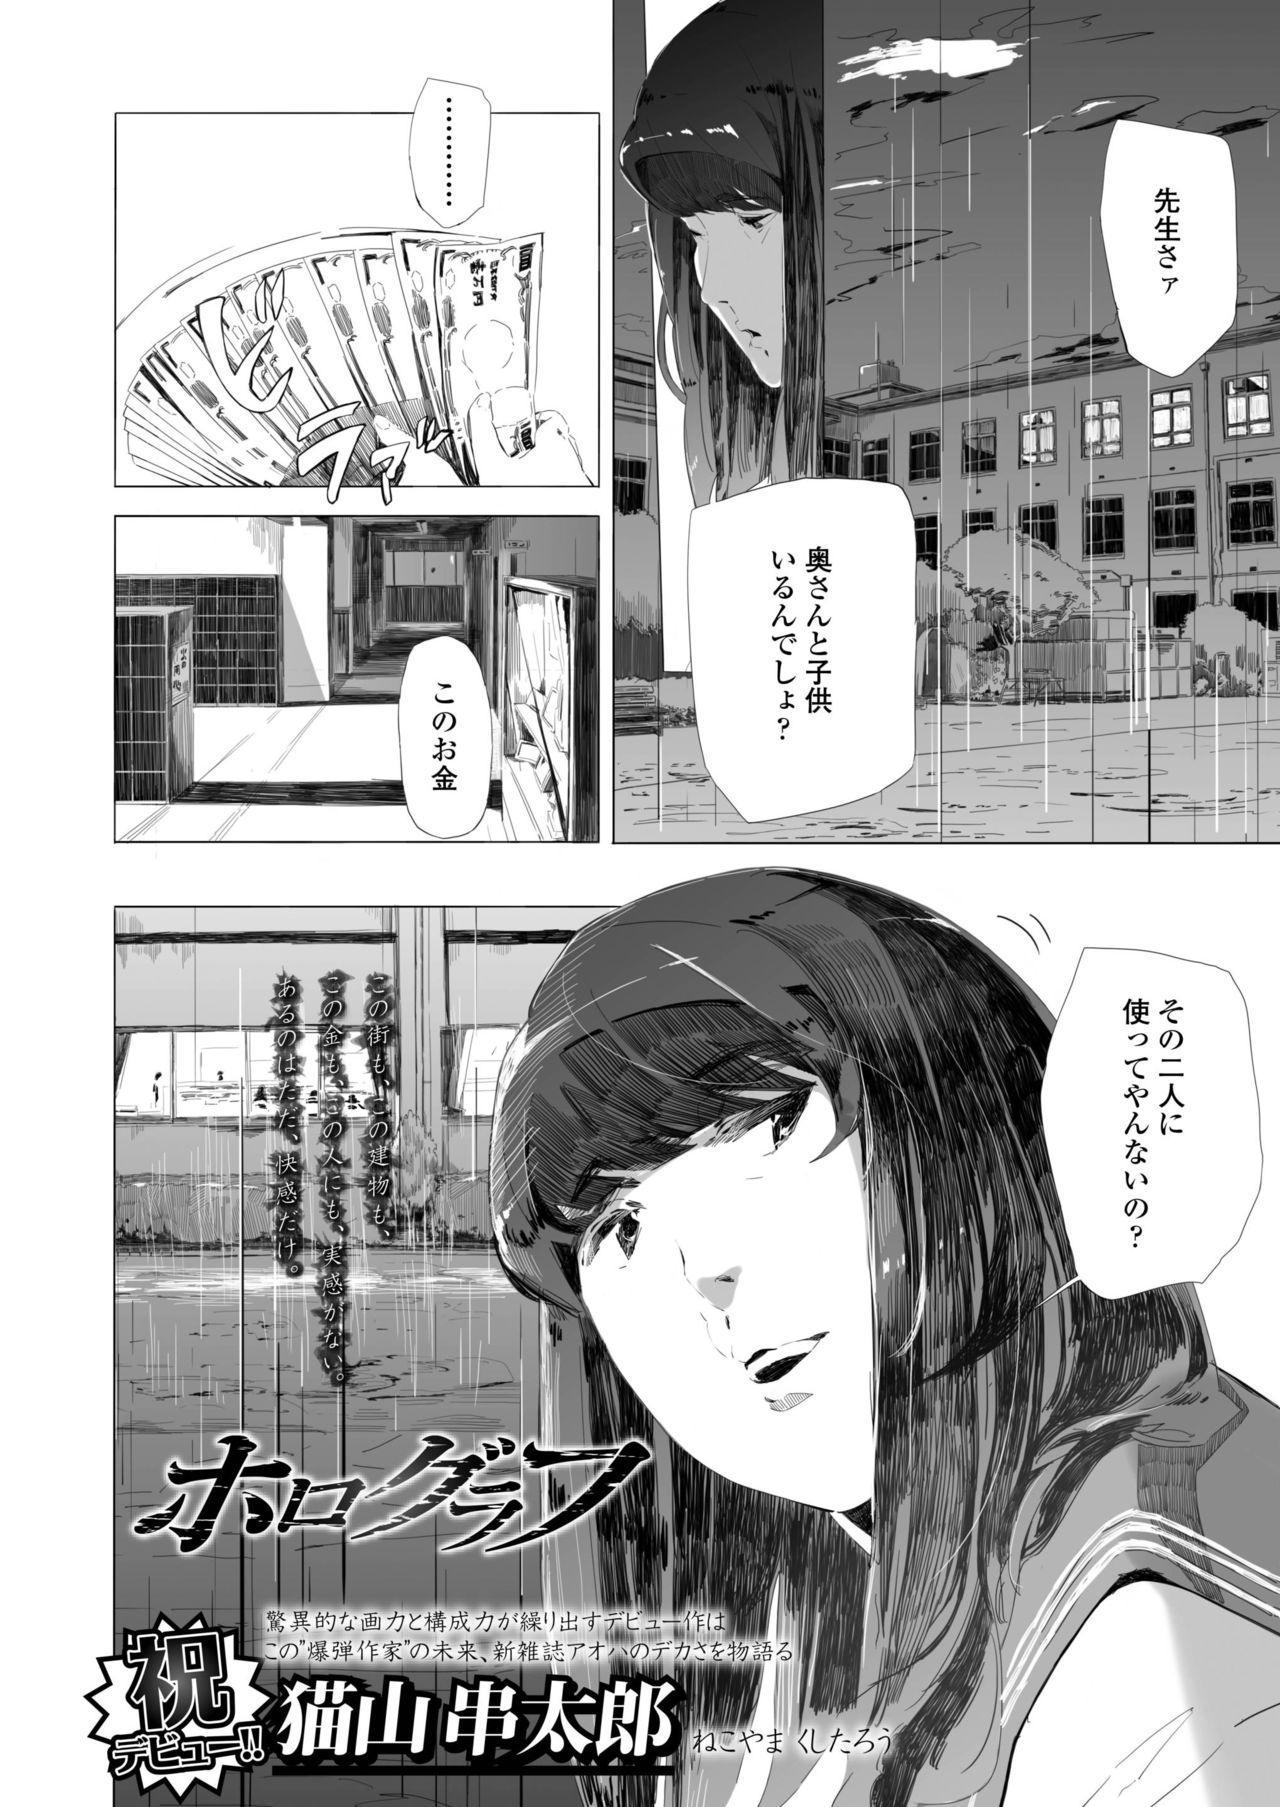 COMIC AOHA 2019 Haru 389